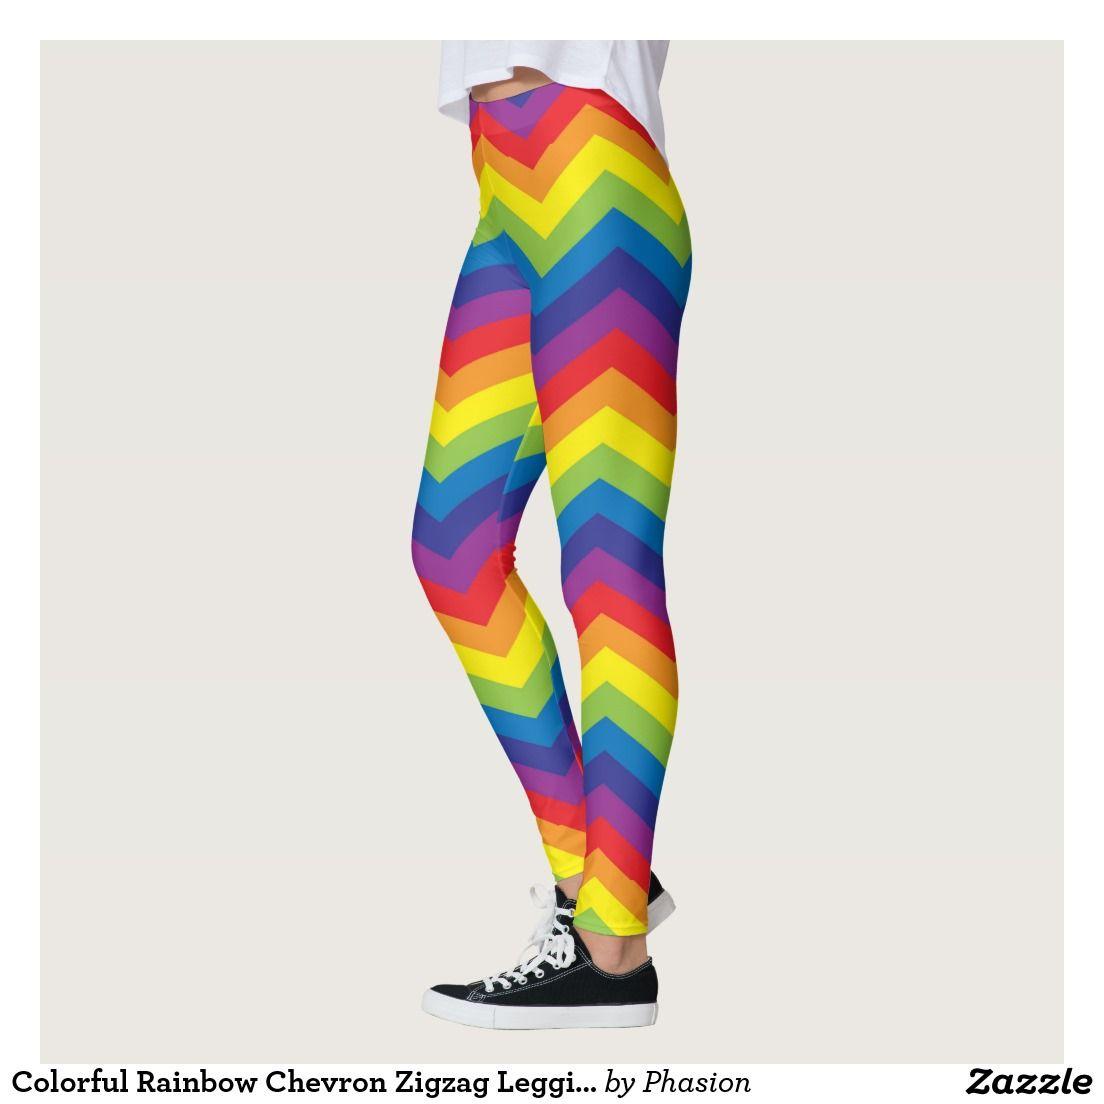 Colorful Rainbow Chevron Zigzag Leggings Zazzle Com Rainbow Chevron Print Patterns Print